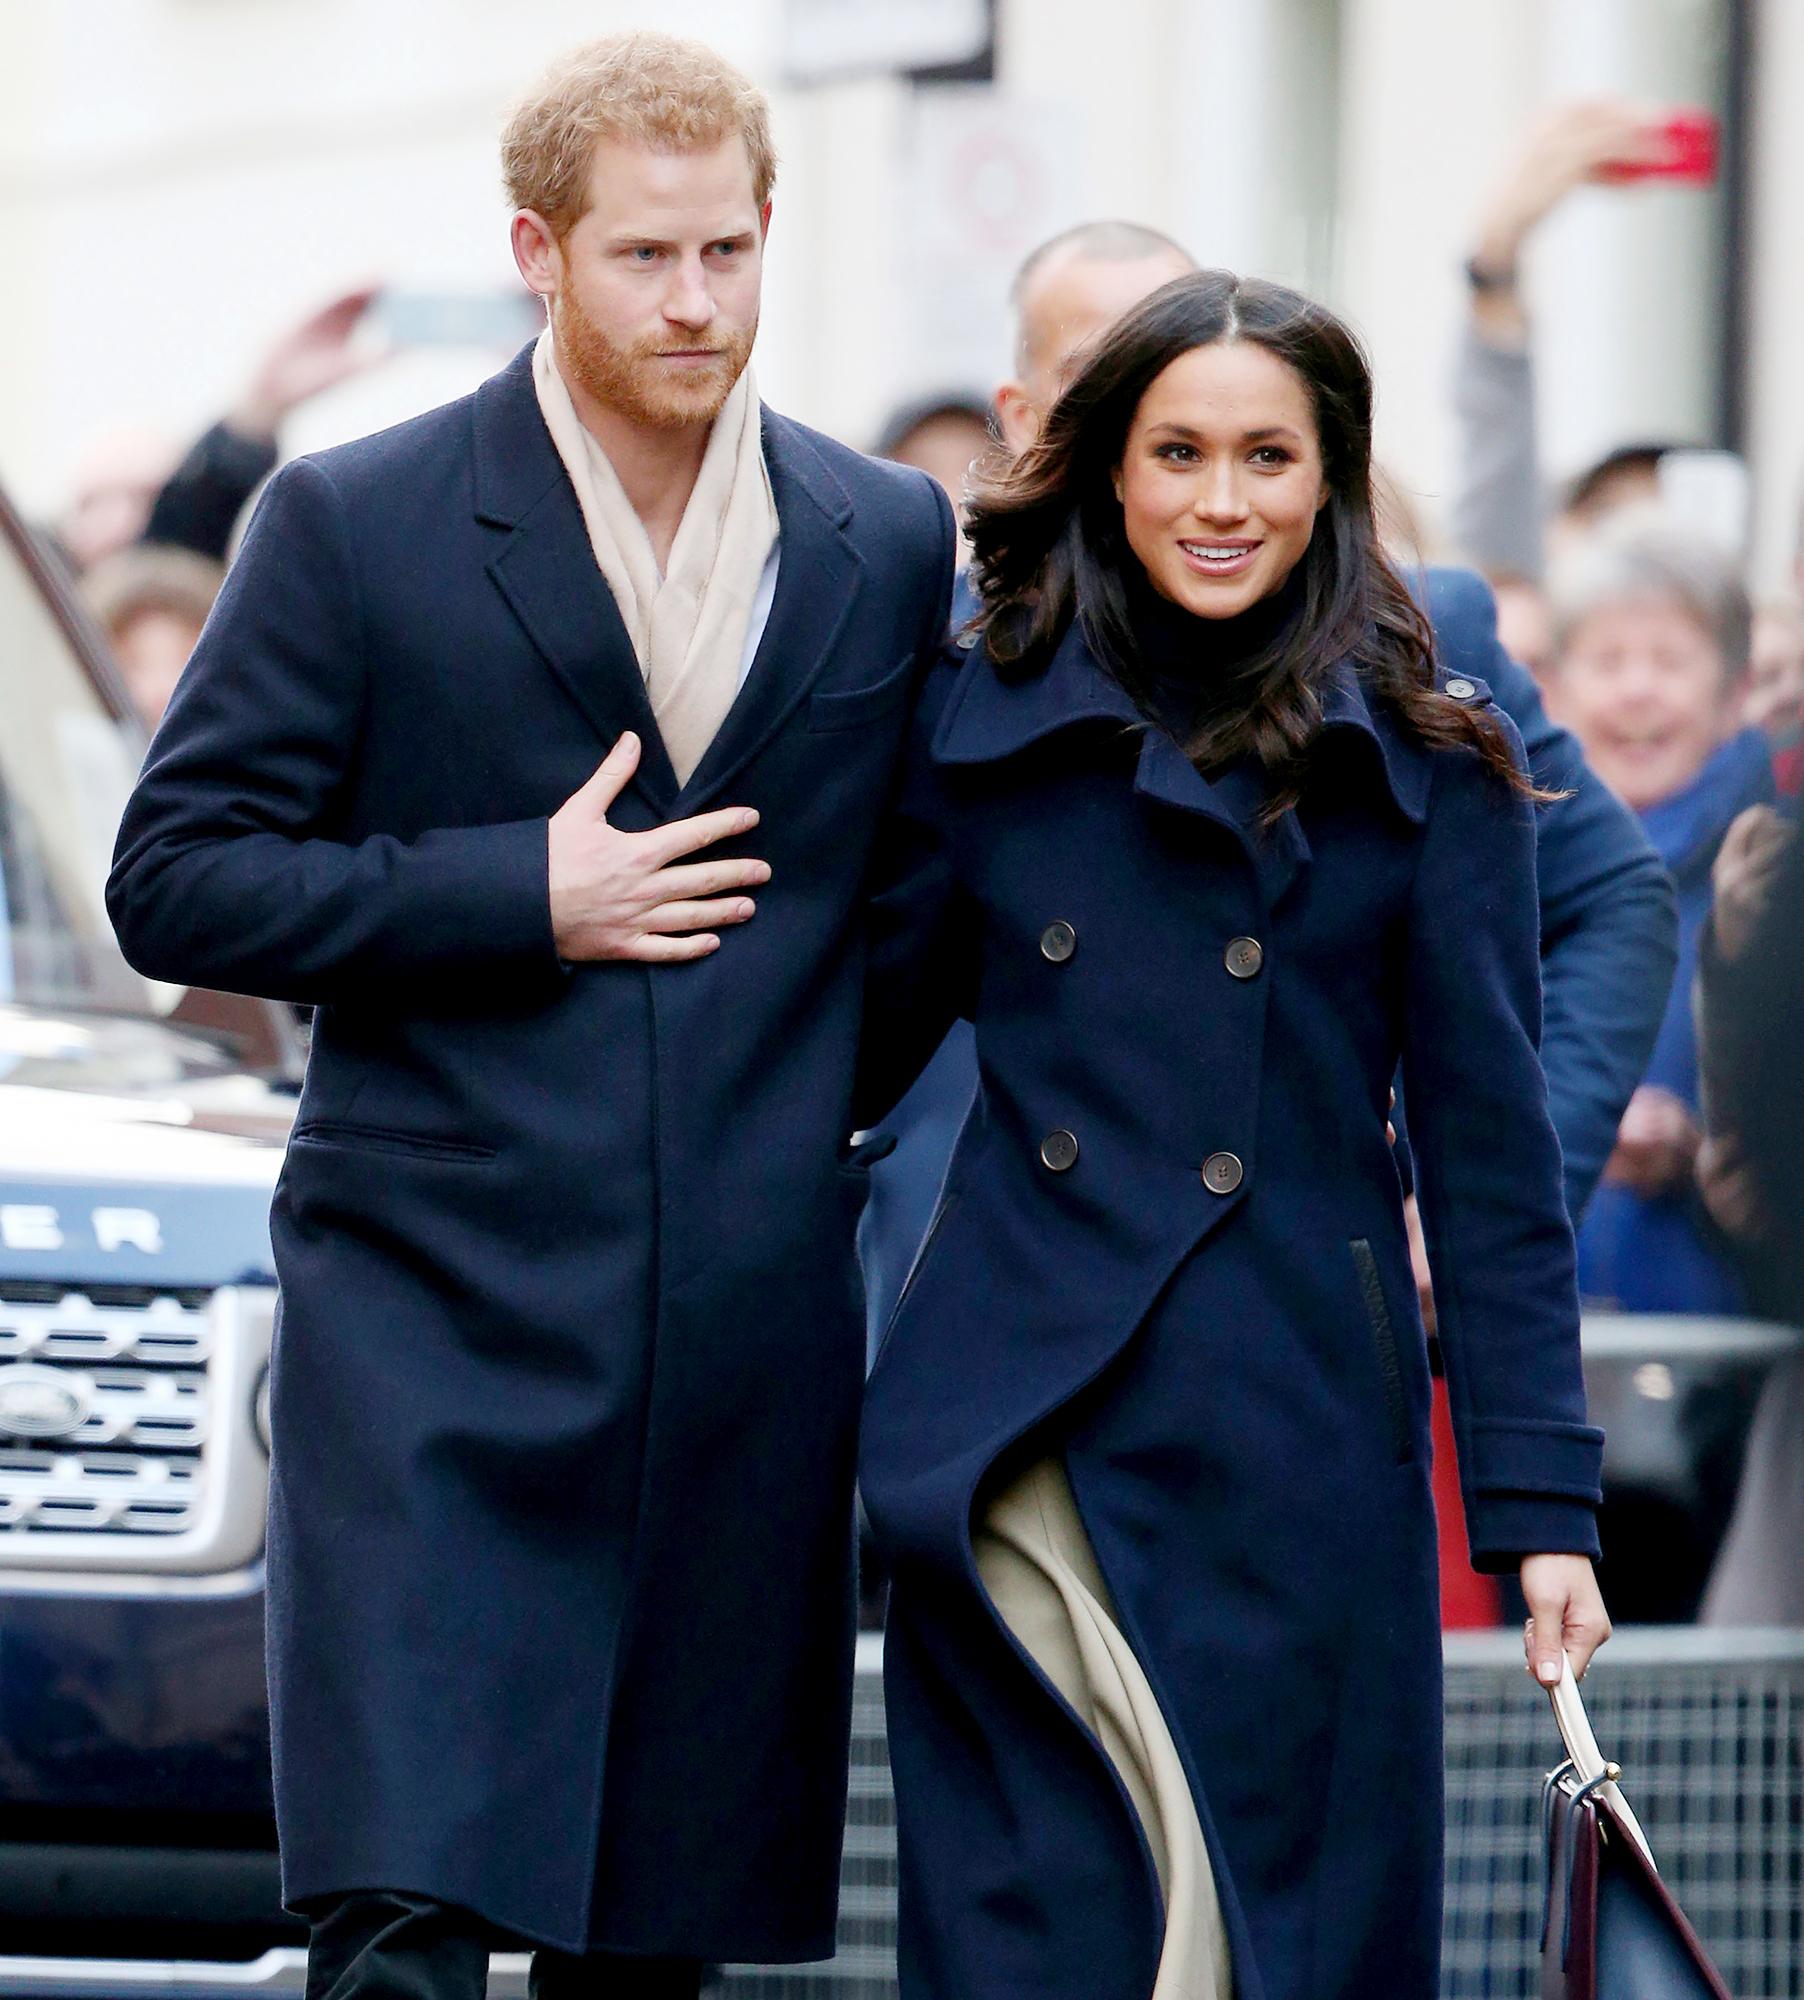 Prince Harry Meghan Markle Called Queen Elizabeth II on Her Birthday